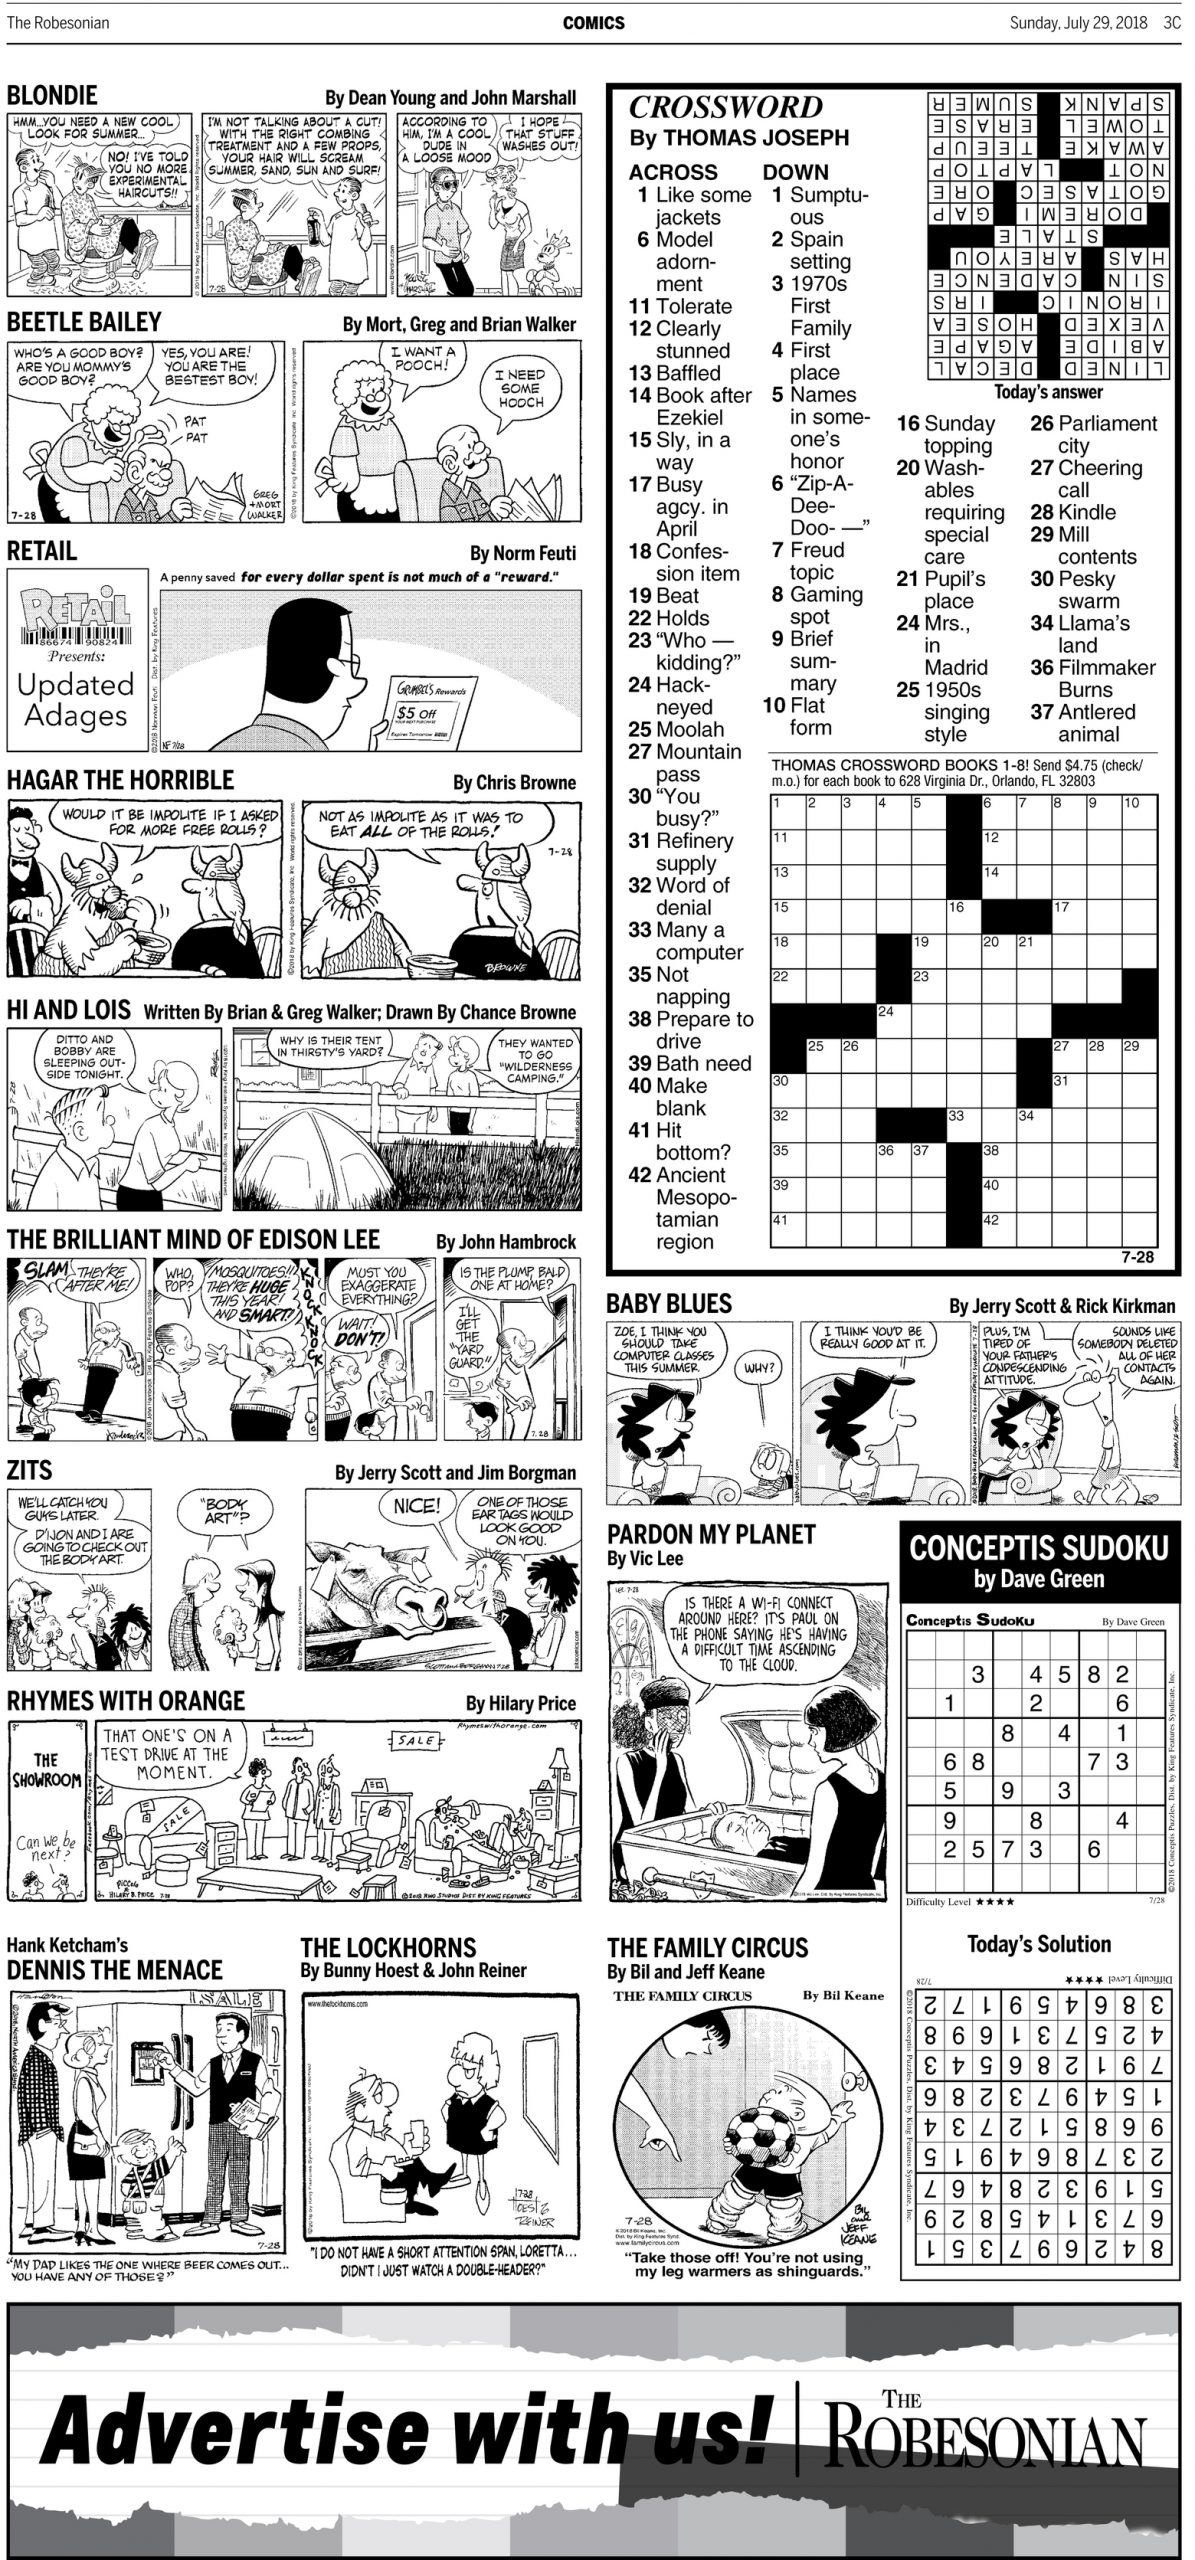 Paper Blames Newsprint Tariffs For Dropping Sunday Comics